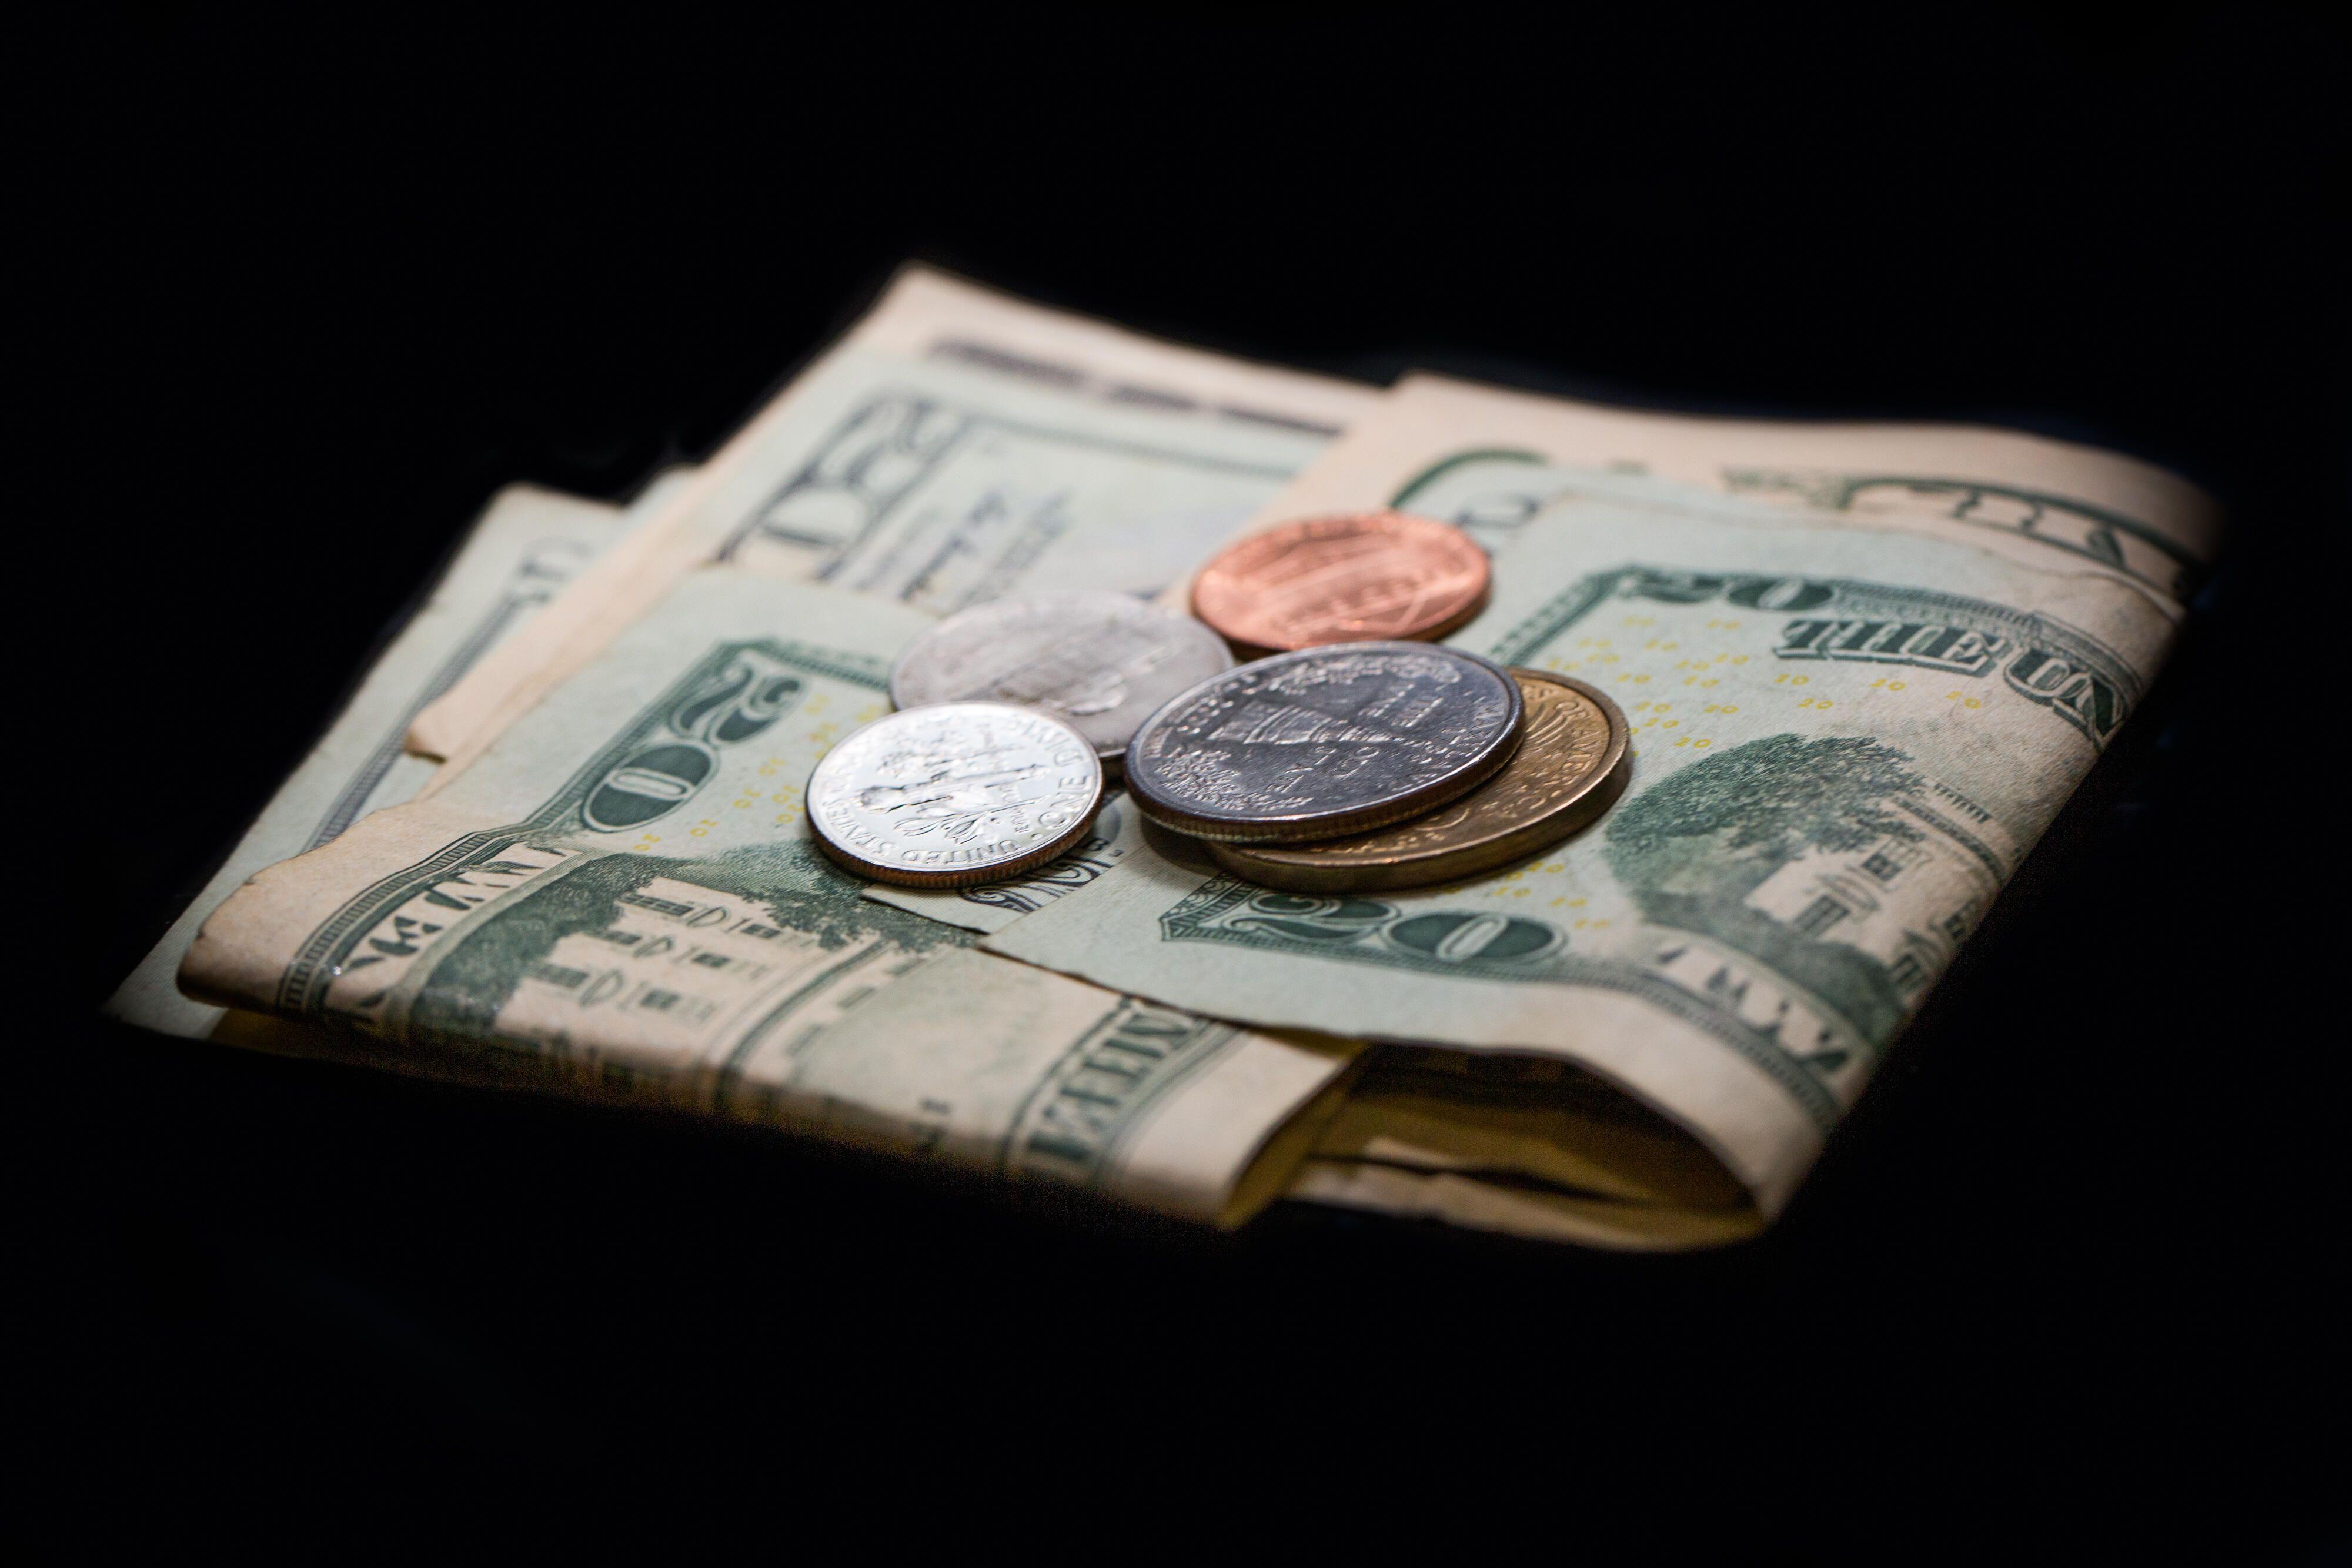 money-bills-wallet-coins-dollars-0939